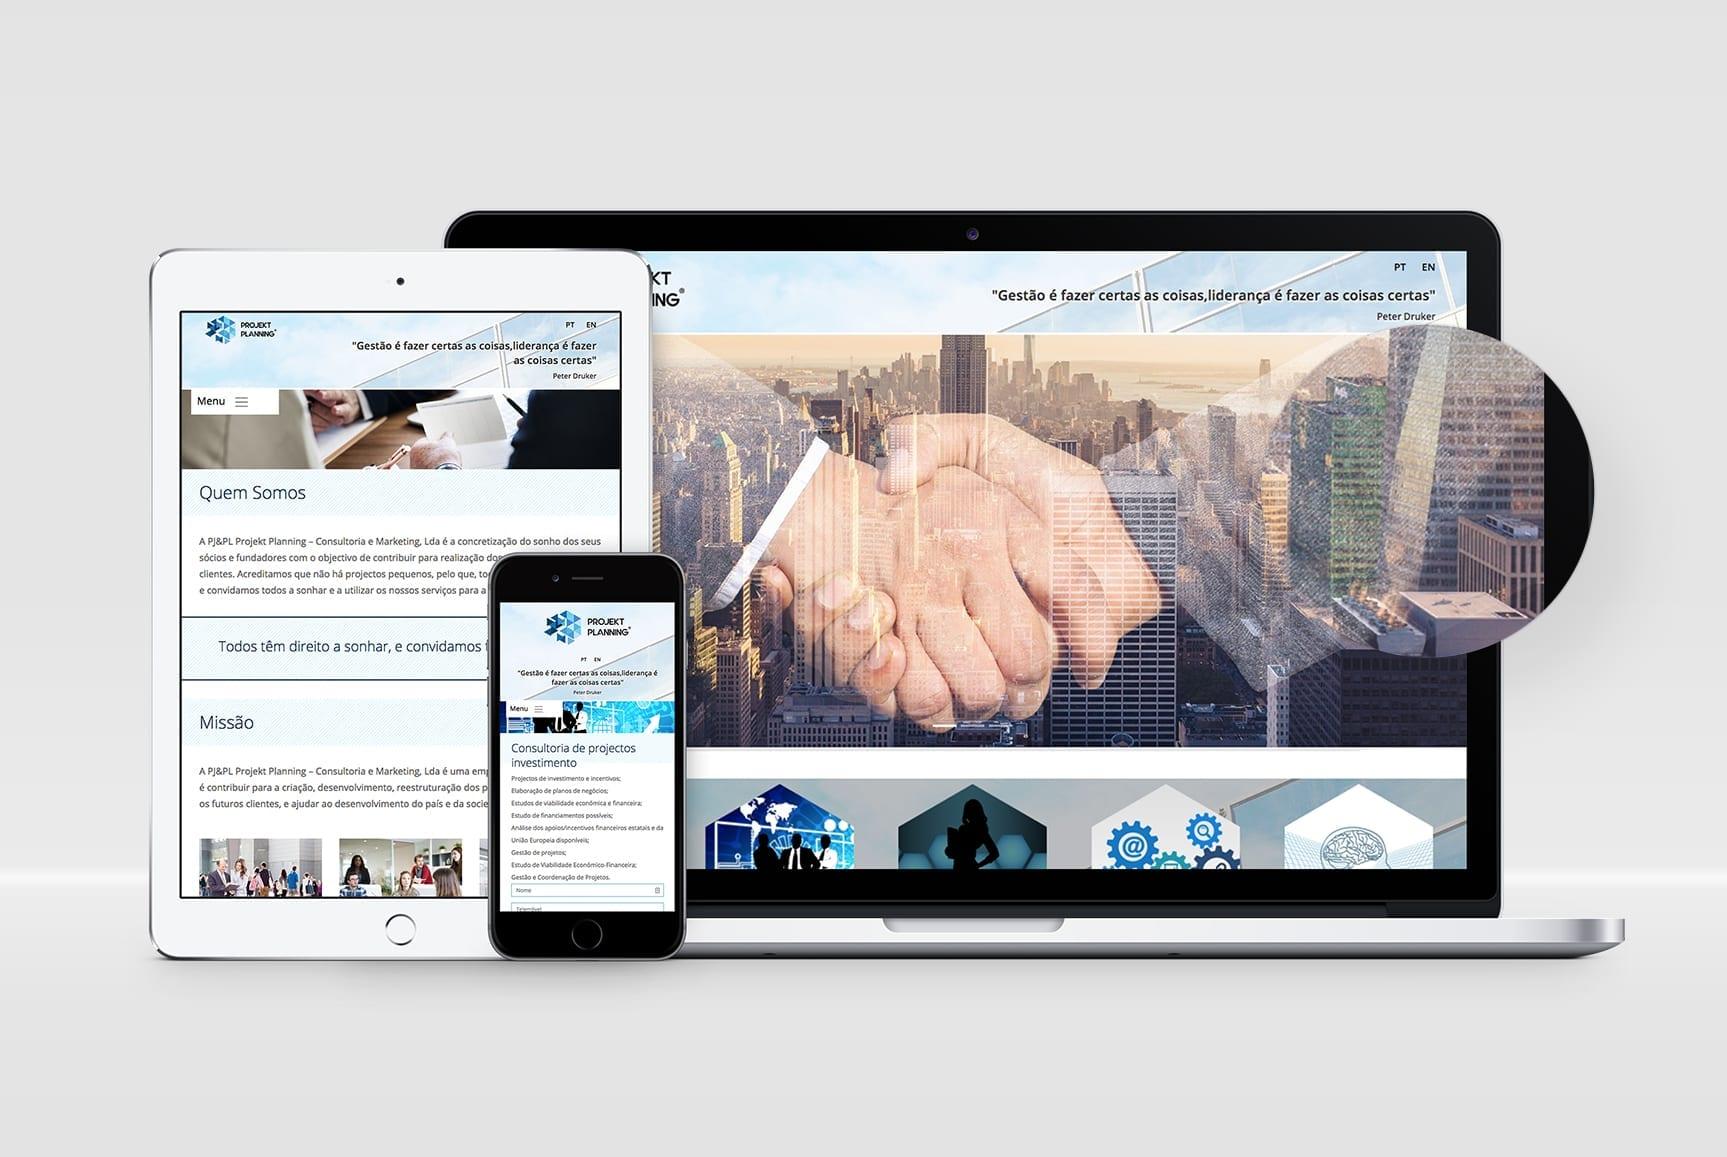 desktop-projektplanning